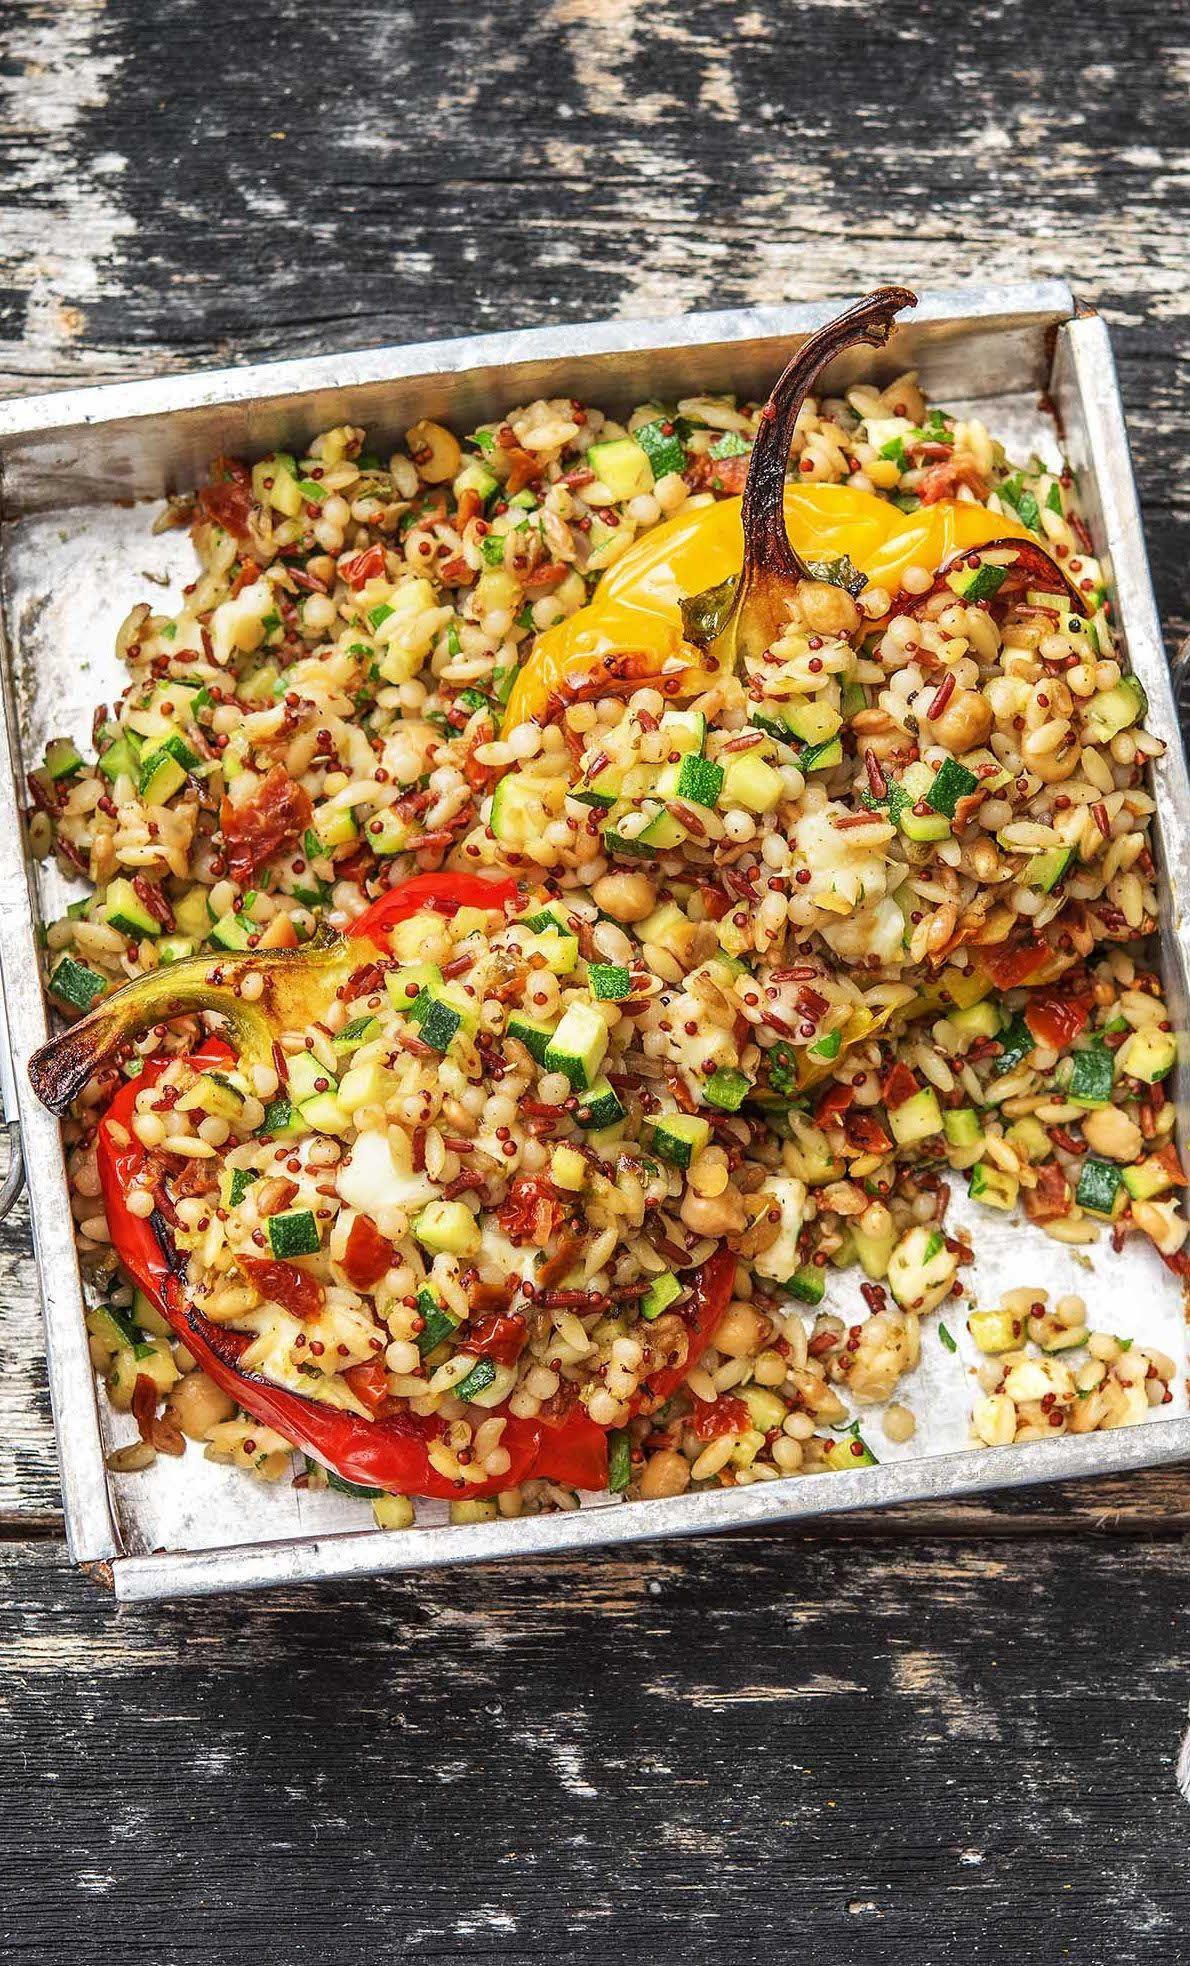 Golden Grain Stuffed Peppers Recipe Hellofresh Recipe Stuffed Peppers Hello Fresh Recipes Vegetarian Recipes